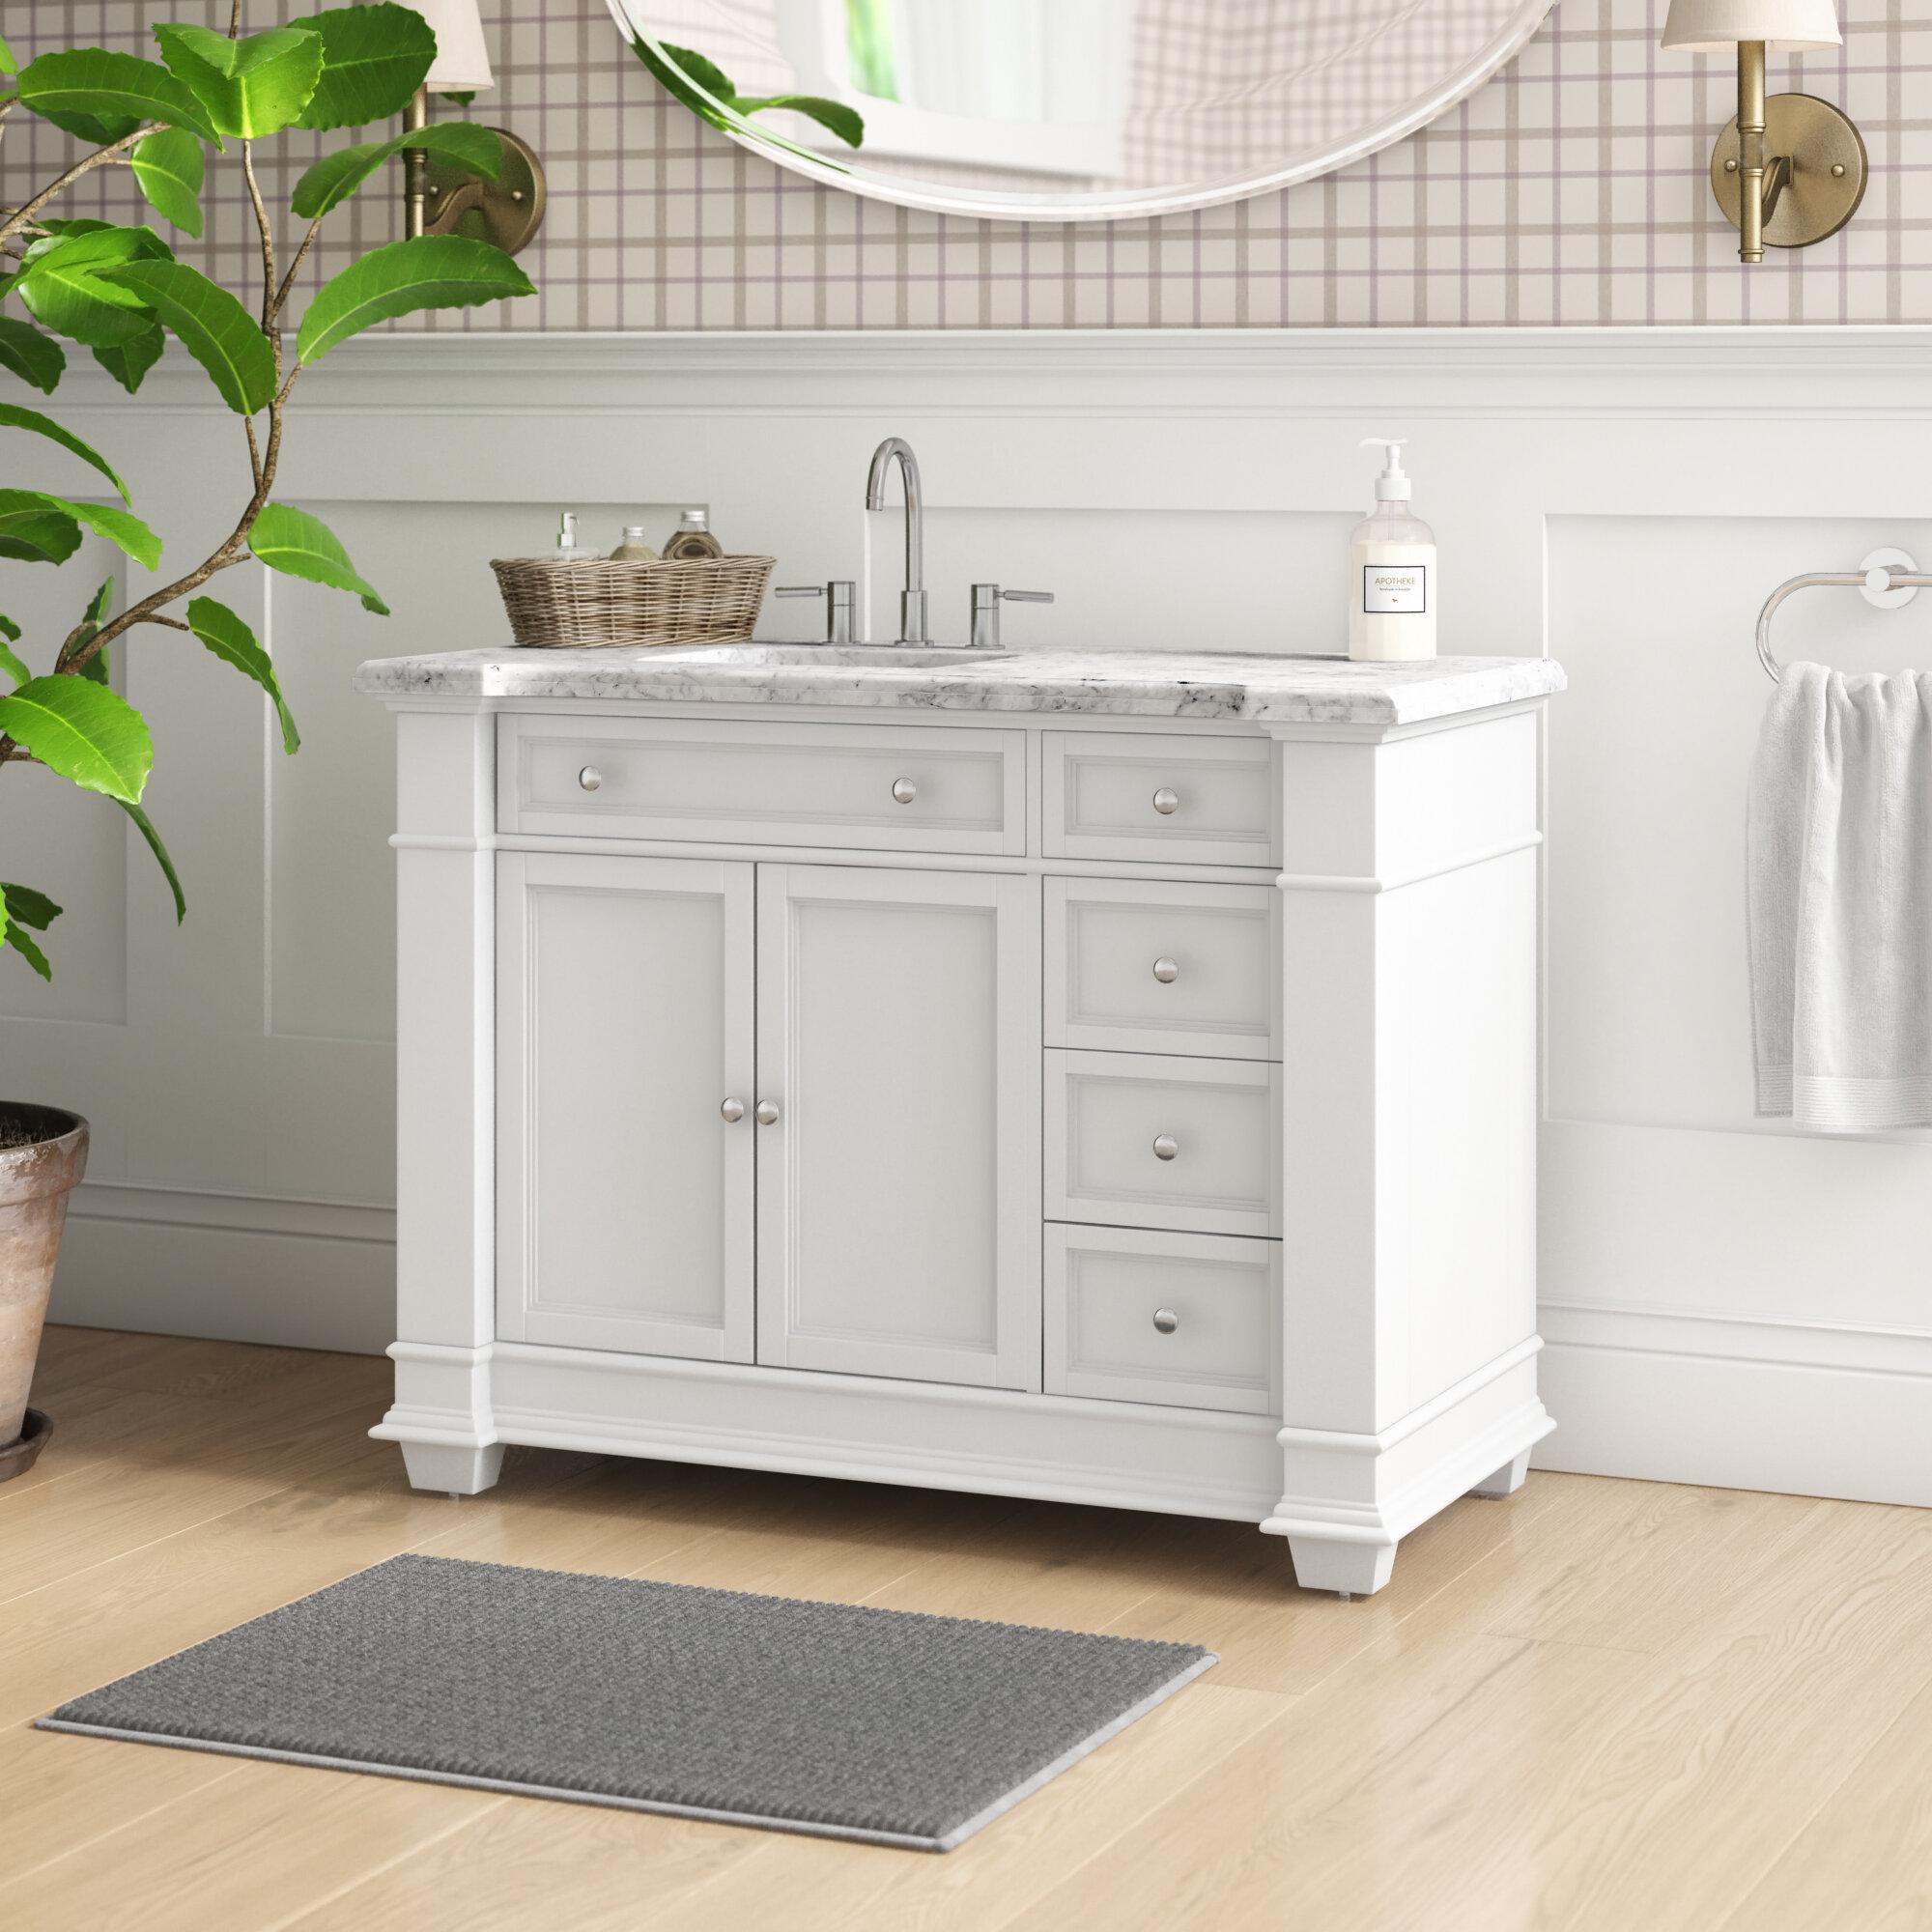 Darby Home Co Riccardo 48 Single Bathroom Vanity Set Reviews Wayfair